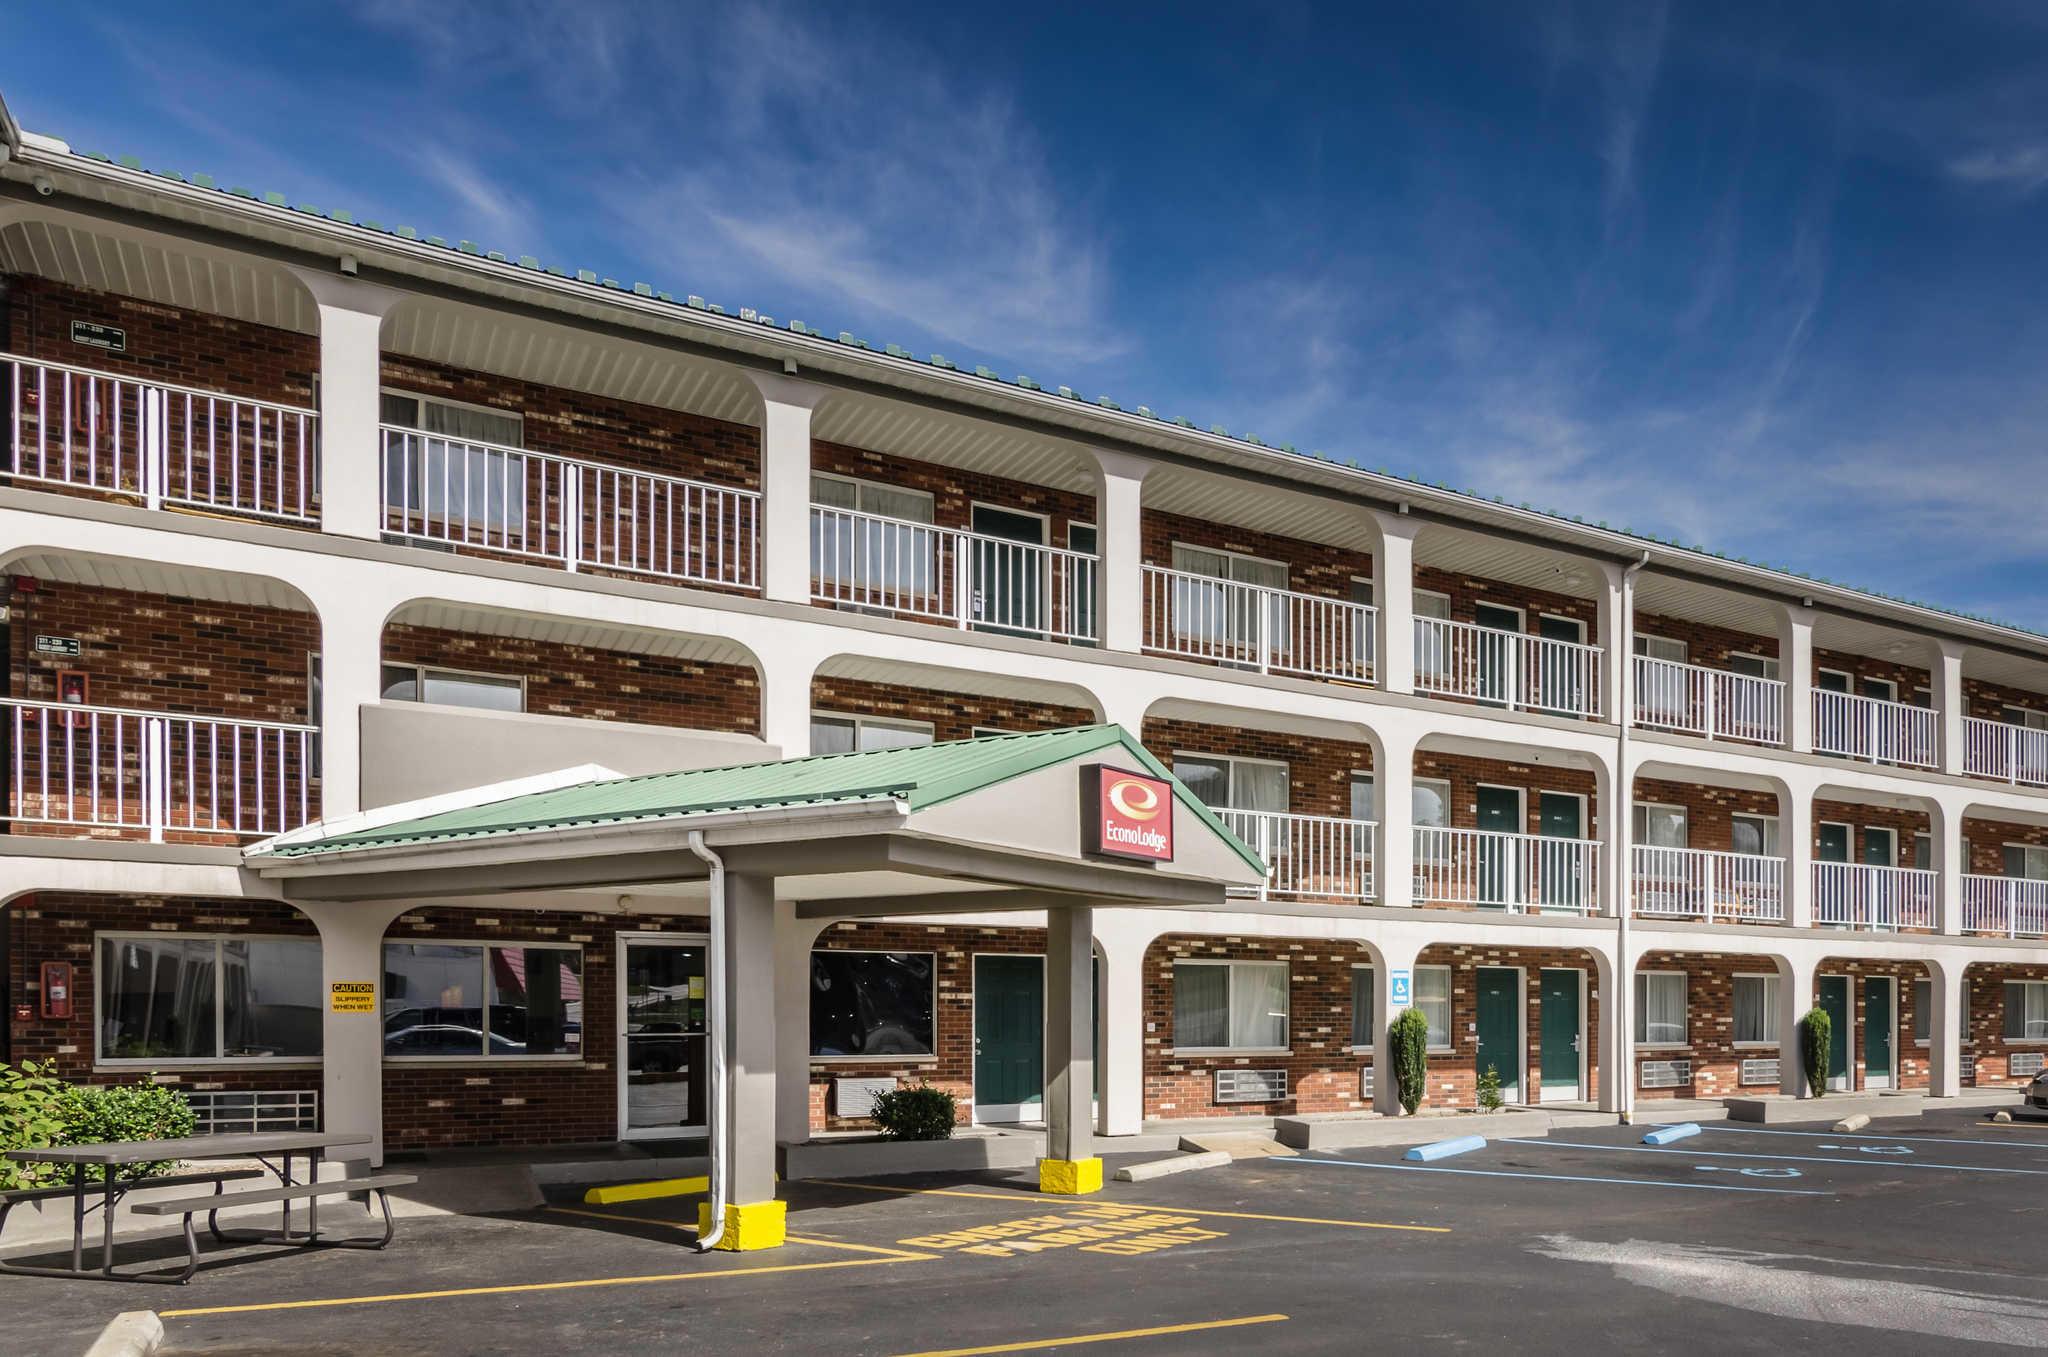 Pet Friendly Hotels In Summersville Wv